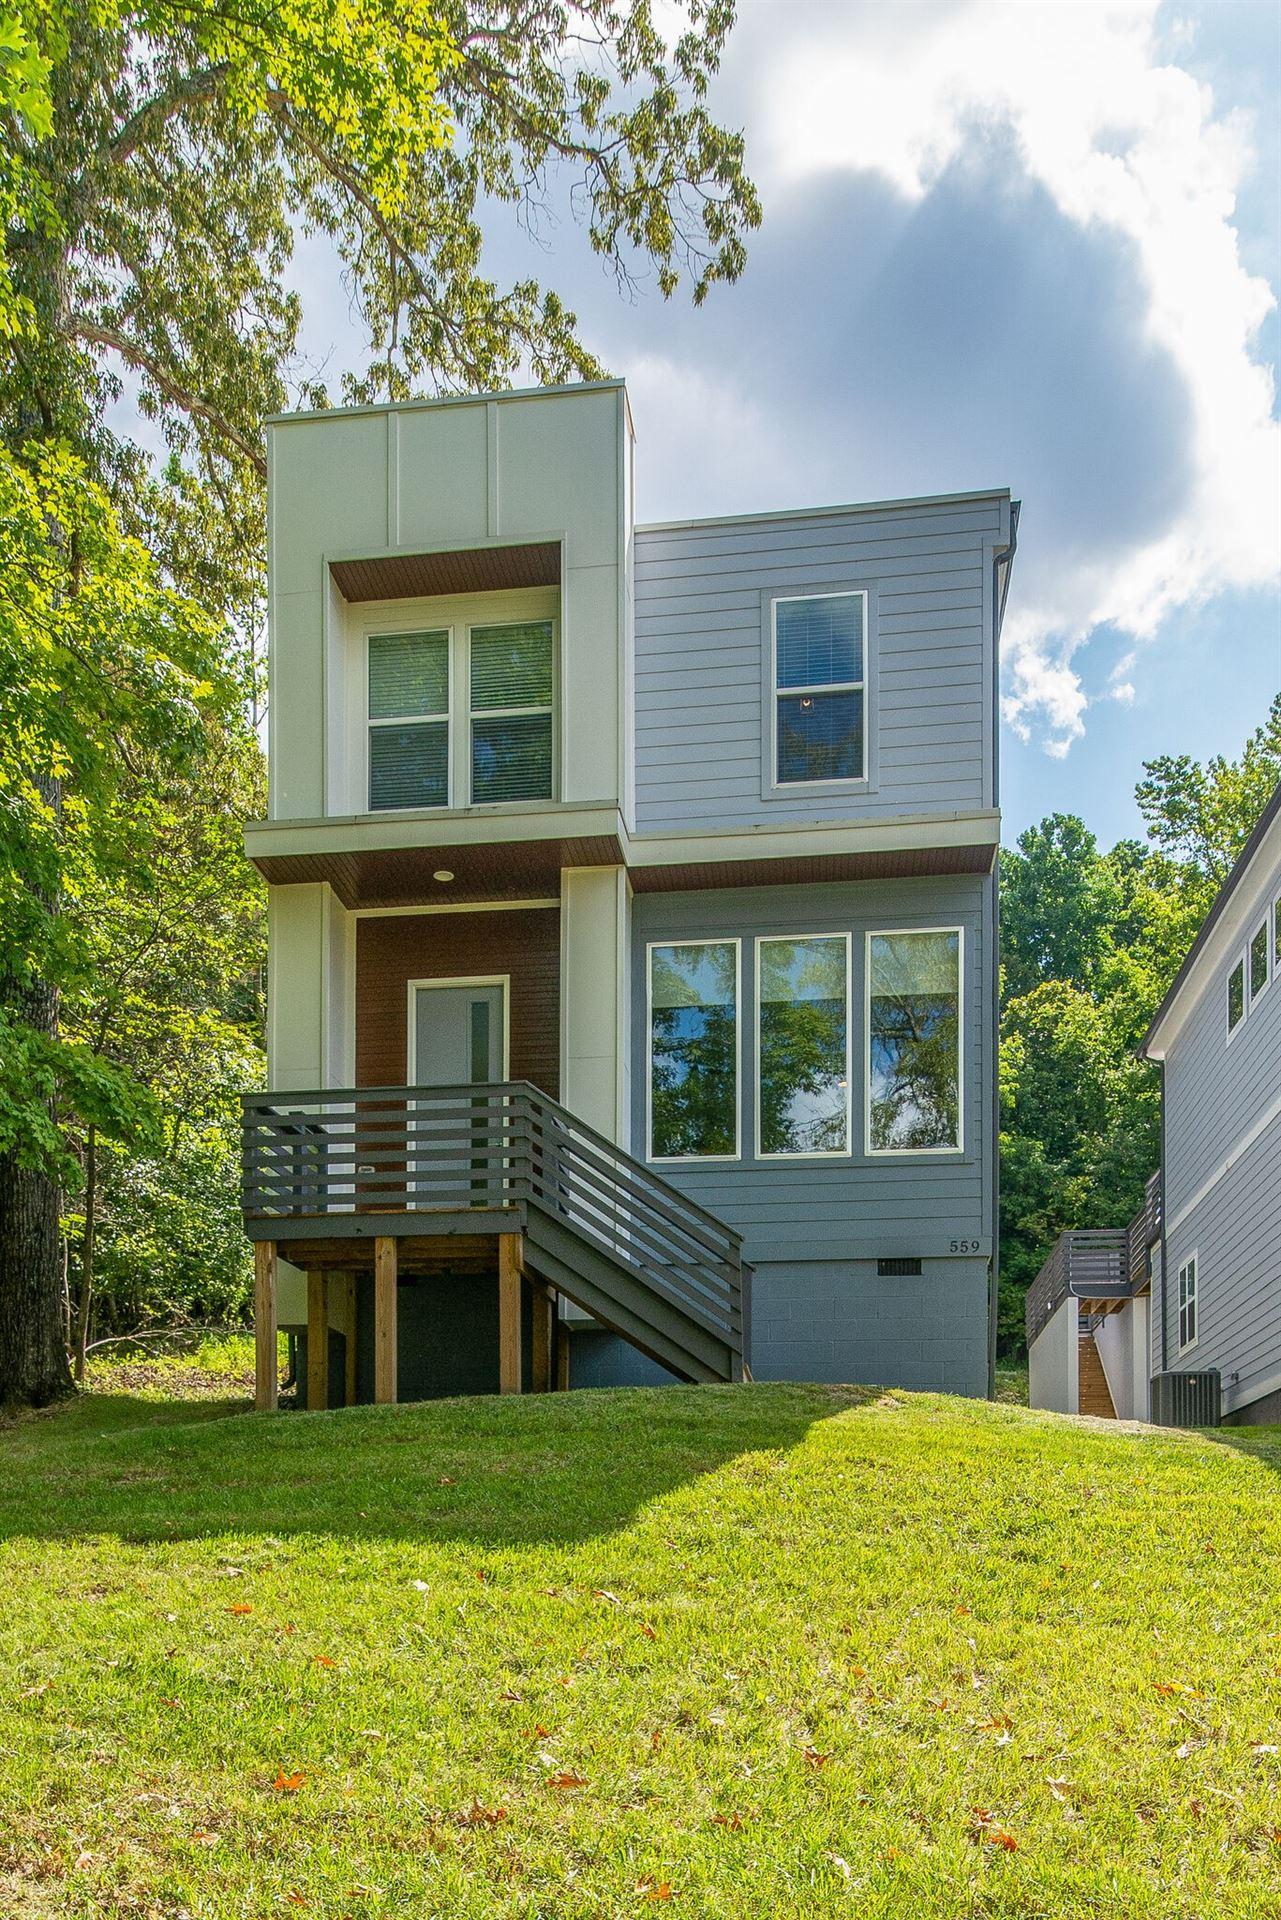 559 Tulip Grove Rd, Hermitage, TN 37076 - MLS#: 2282800